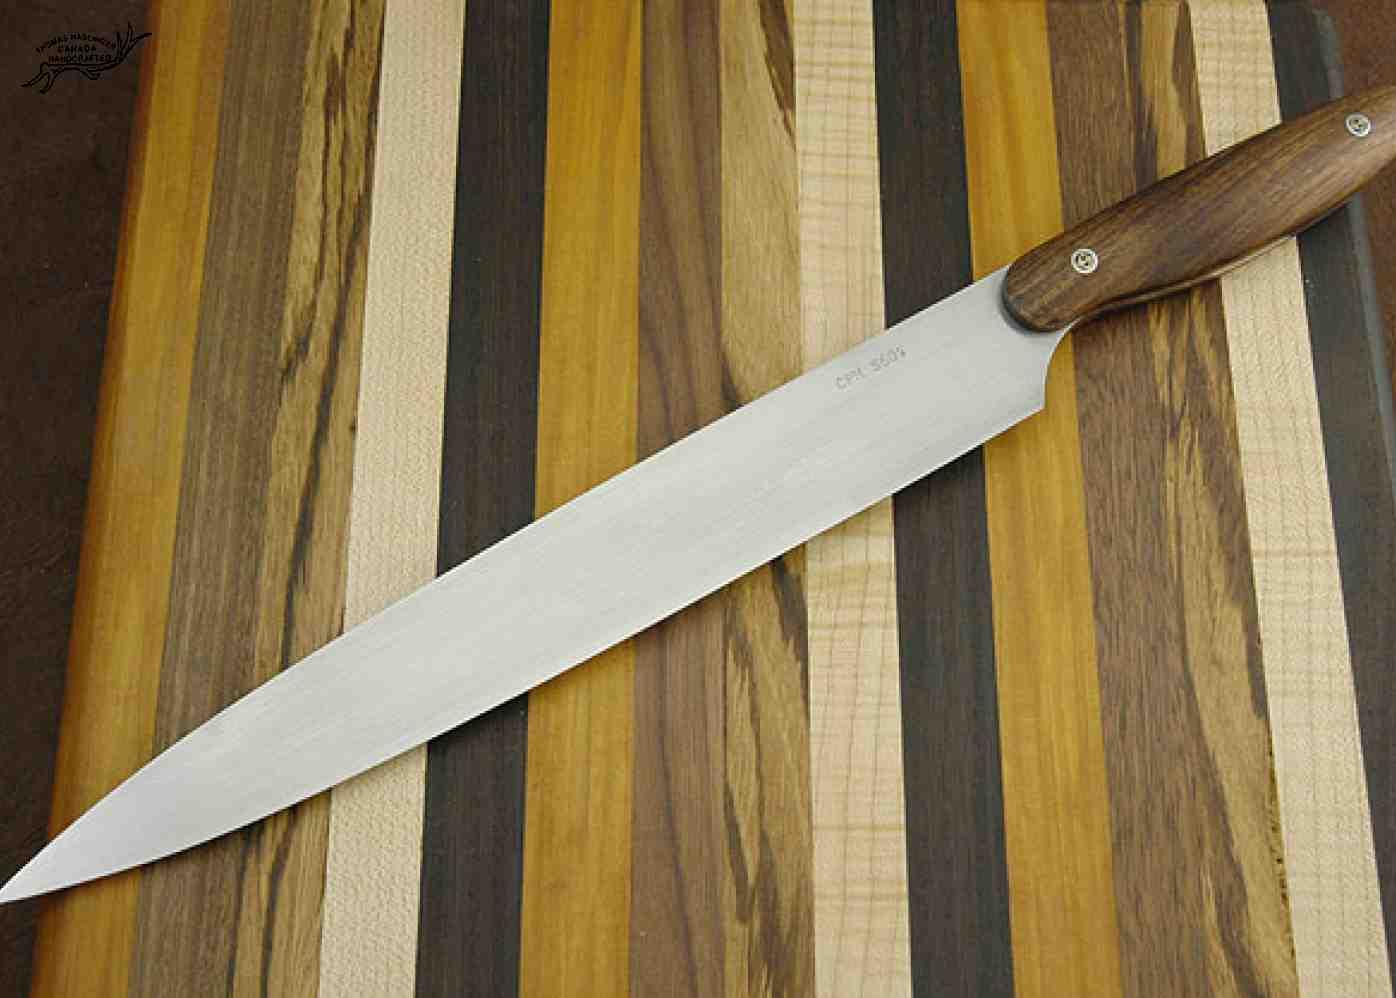 sashimi chef knife with curly koa handle haslinger knives. Black Bedroom Furniture Sets. Home Design Ideas